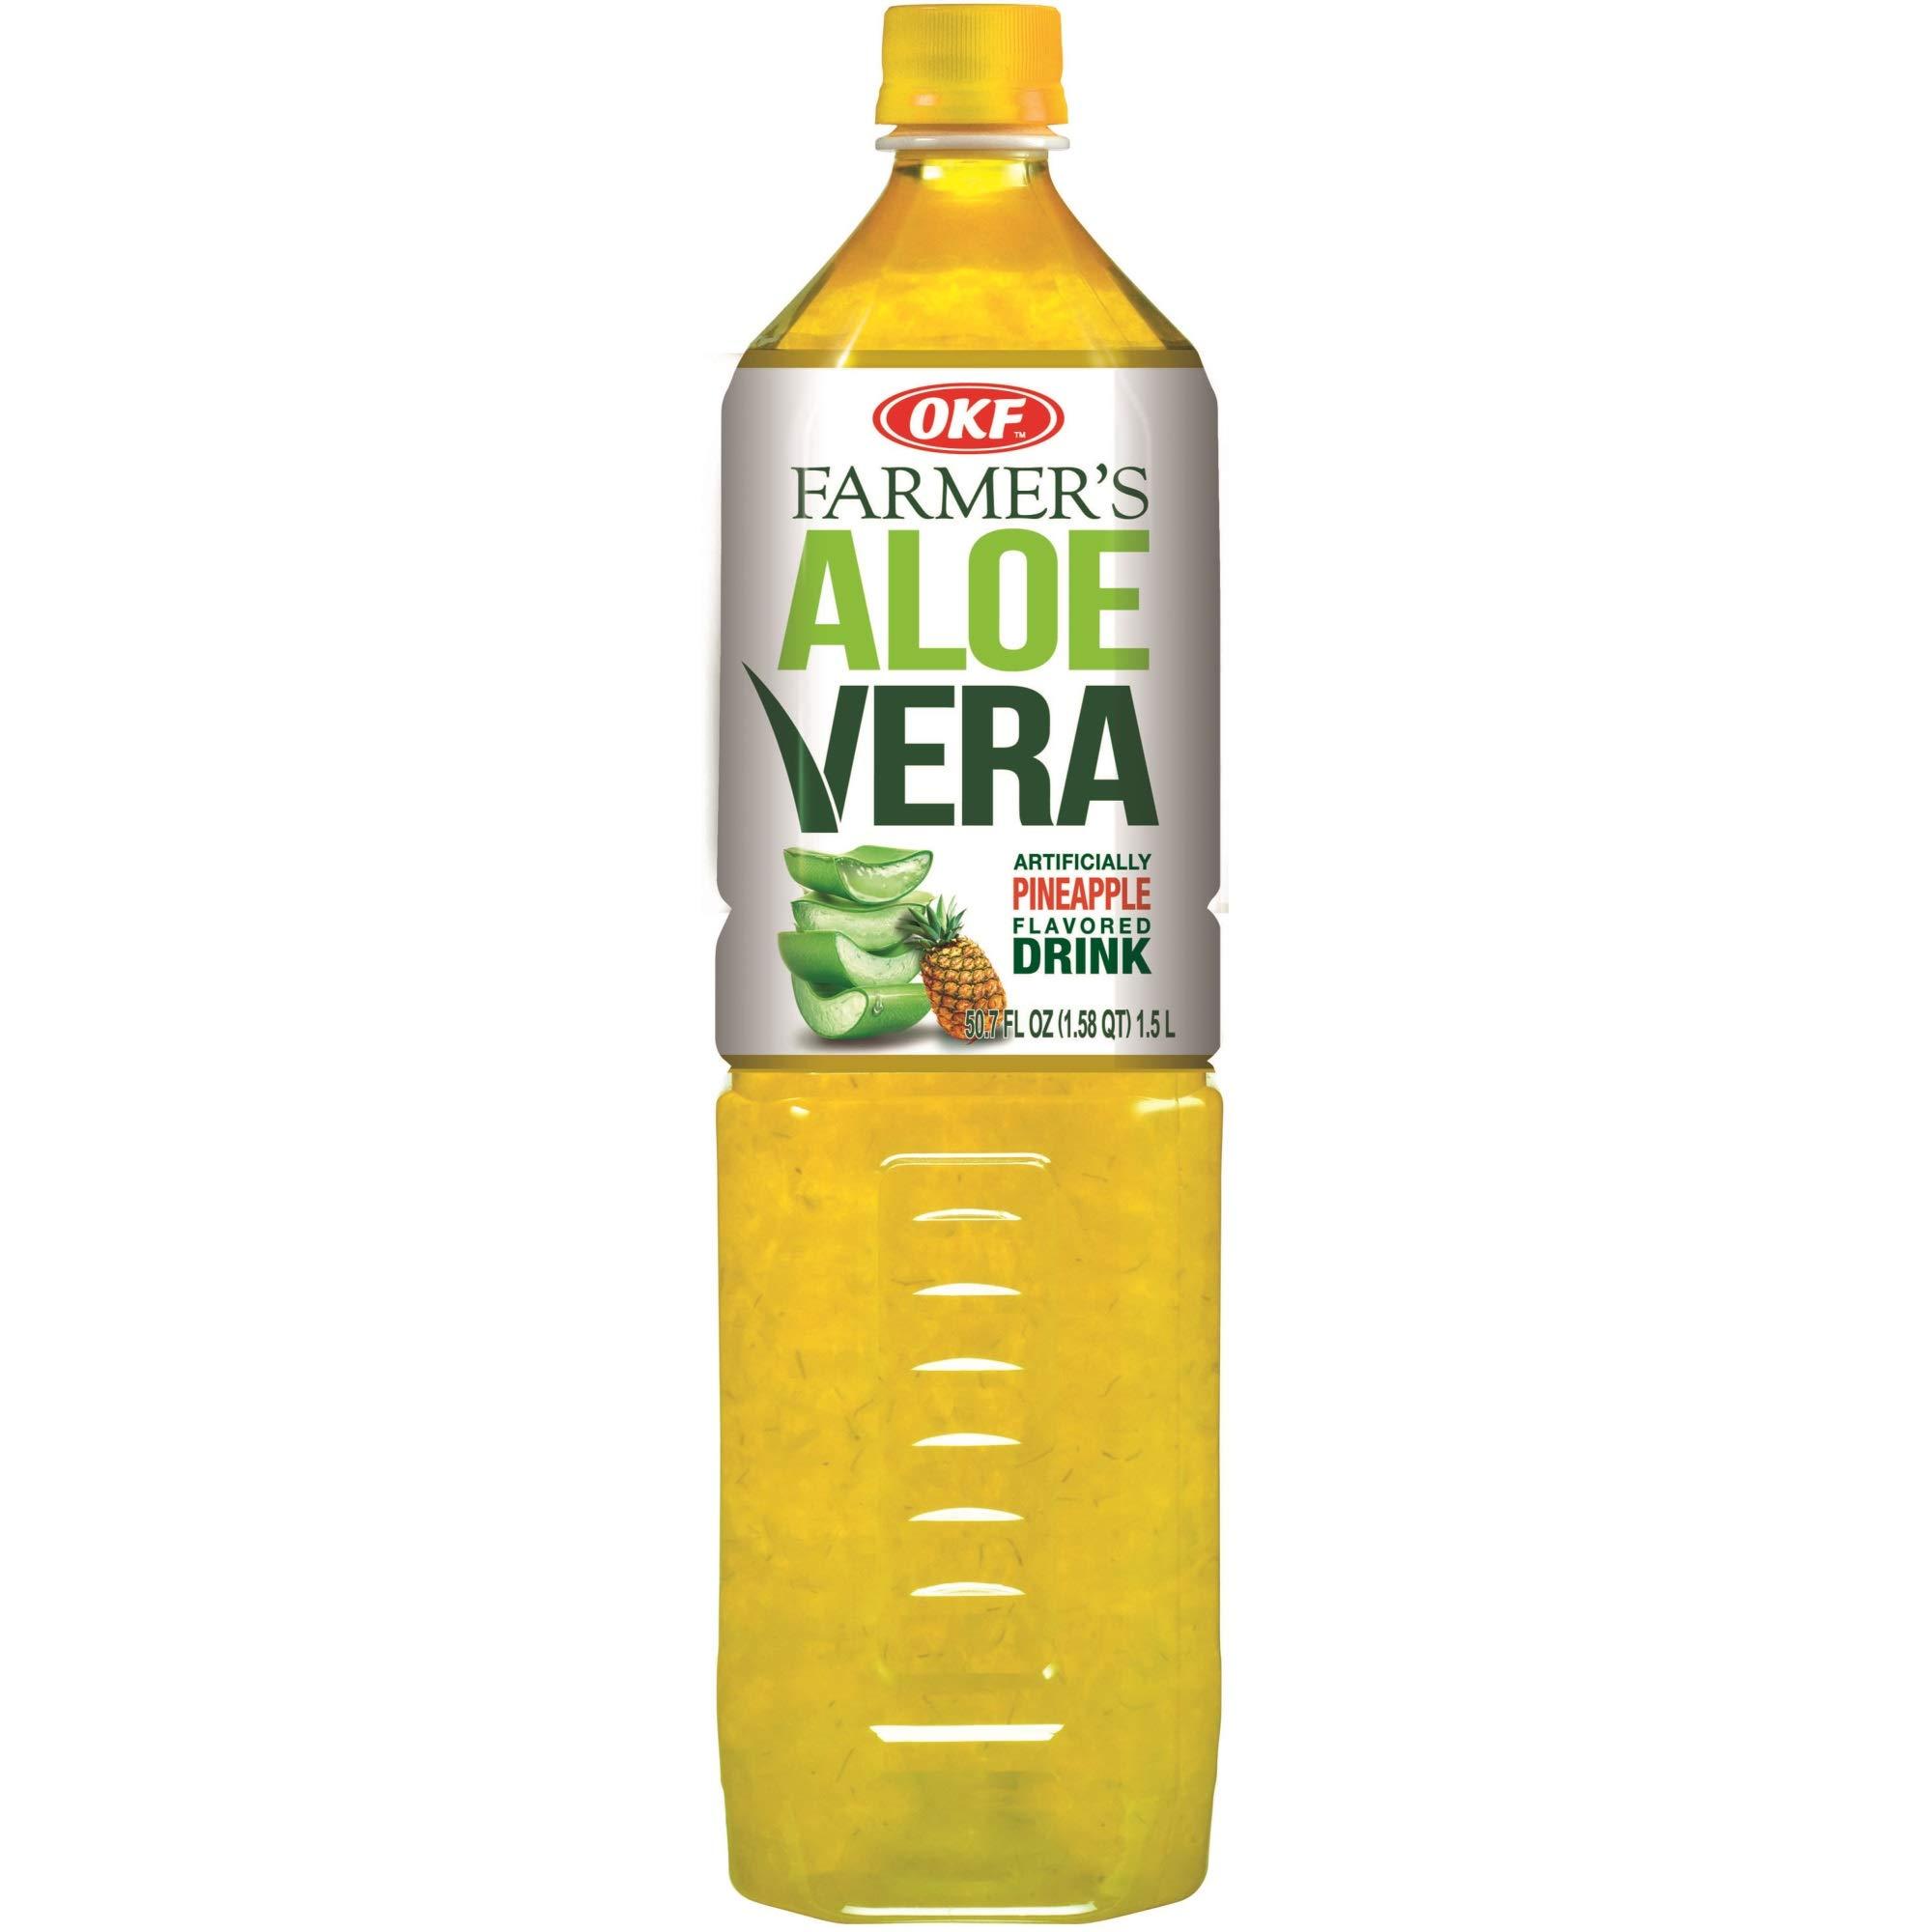 OKF Farmer's Aloe Vera Drink, Pineapple, 1.5 Liter (Pack of 12) by OKF